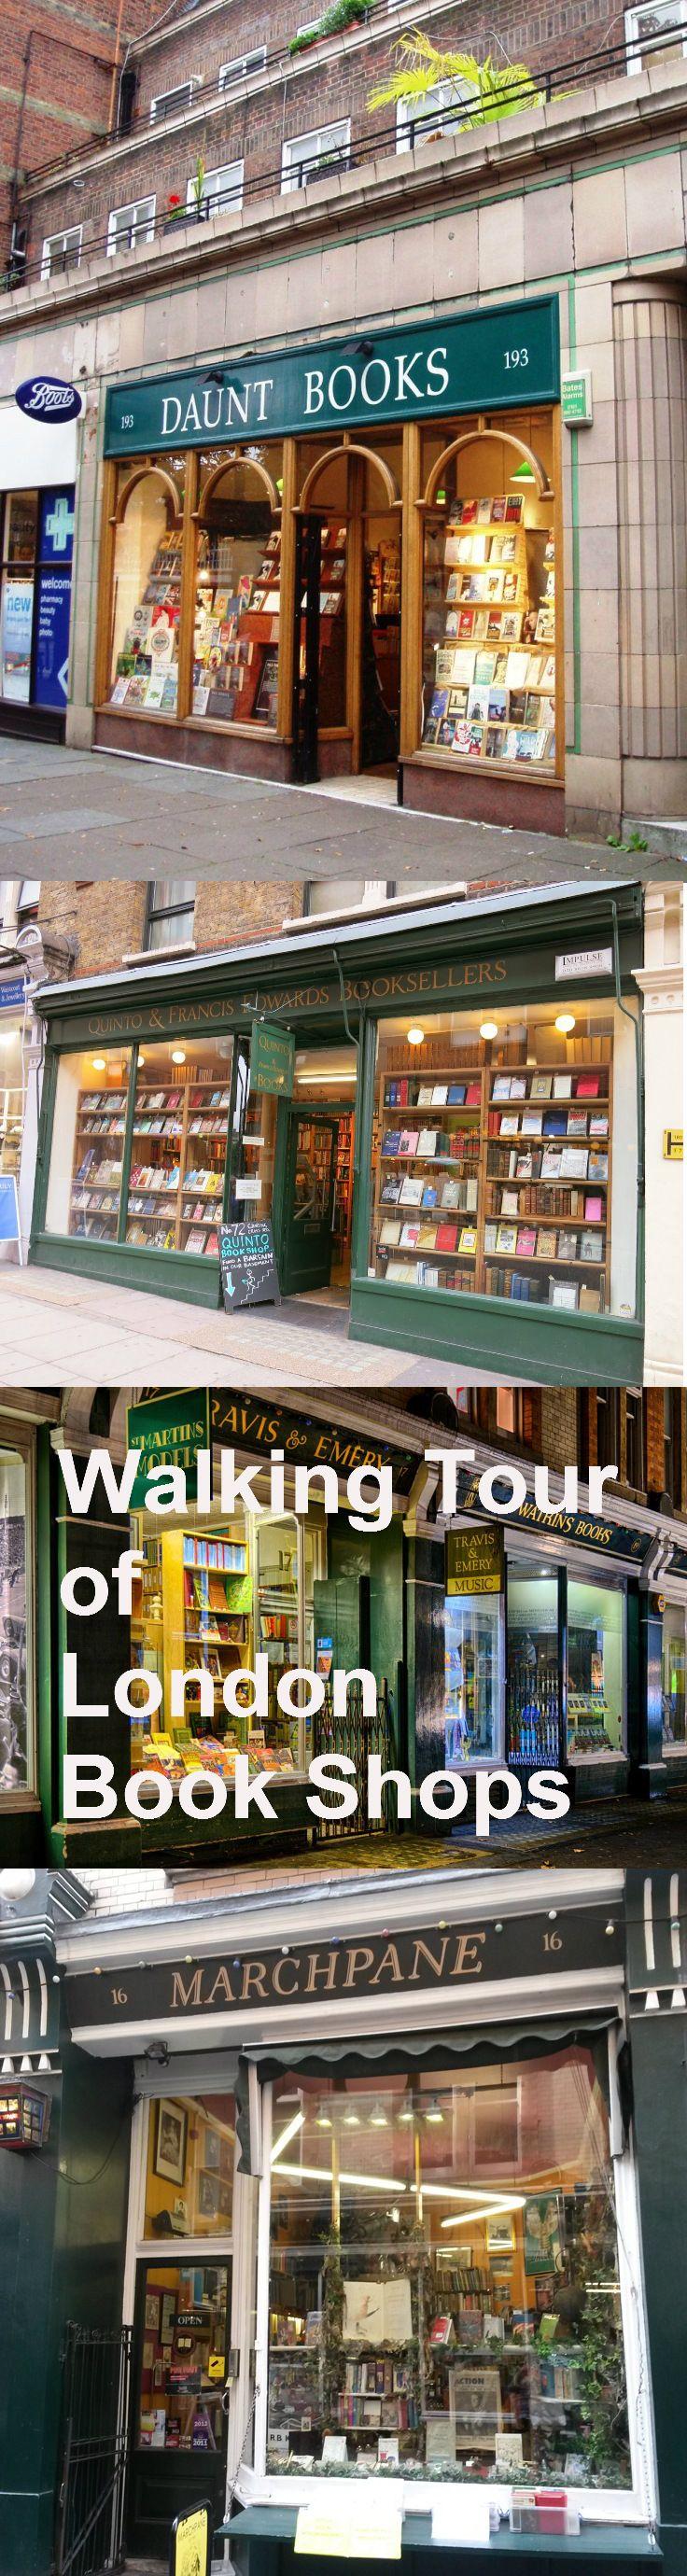 Walking Tour of London Book Shops